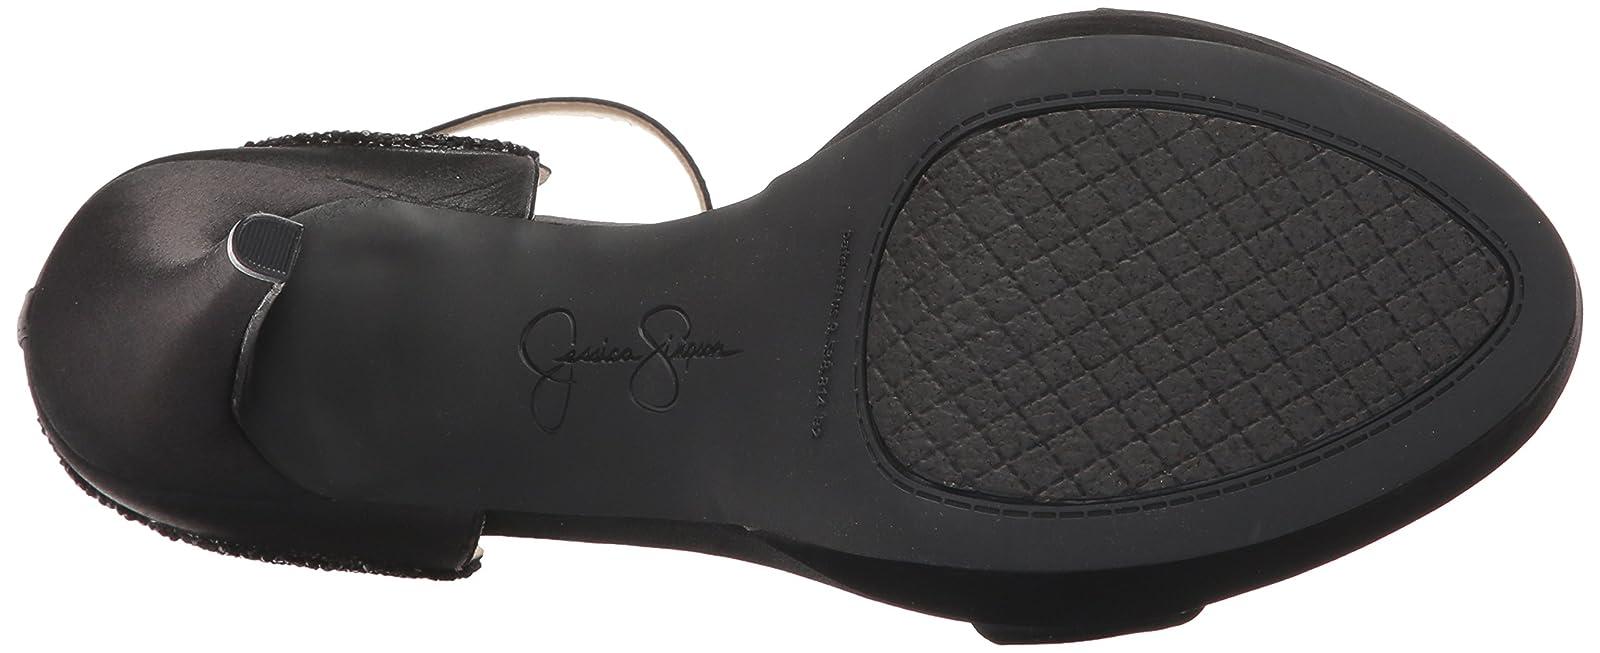 Jessica Simpson Women's BAYVINN Heeled Sandal US - 3